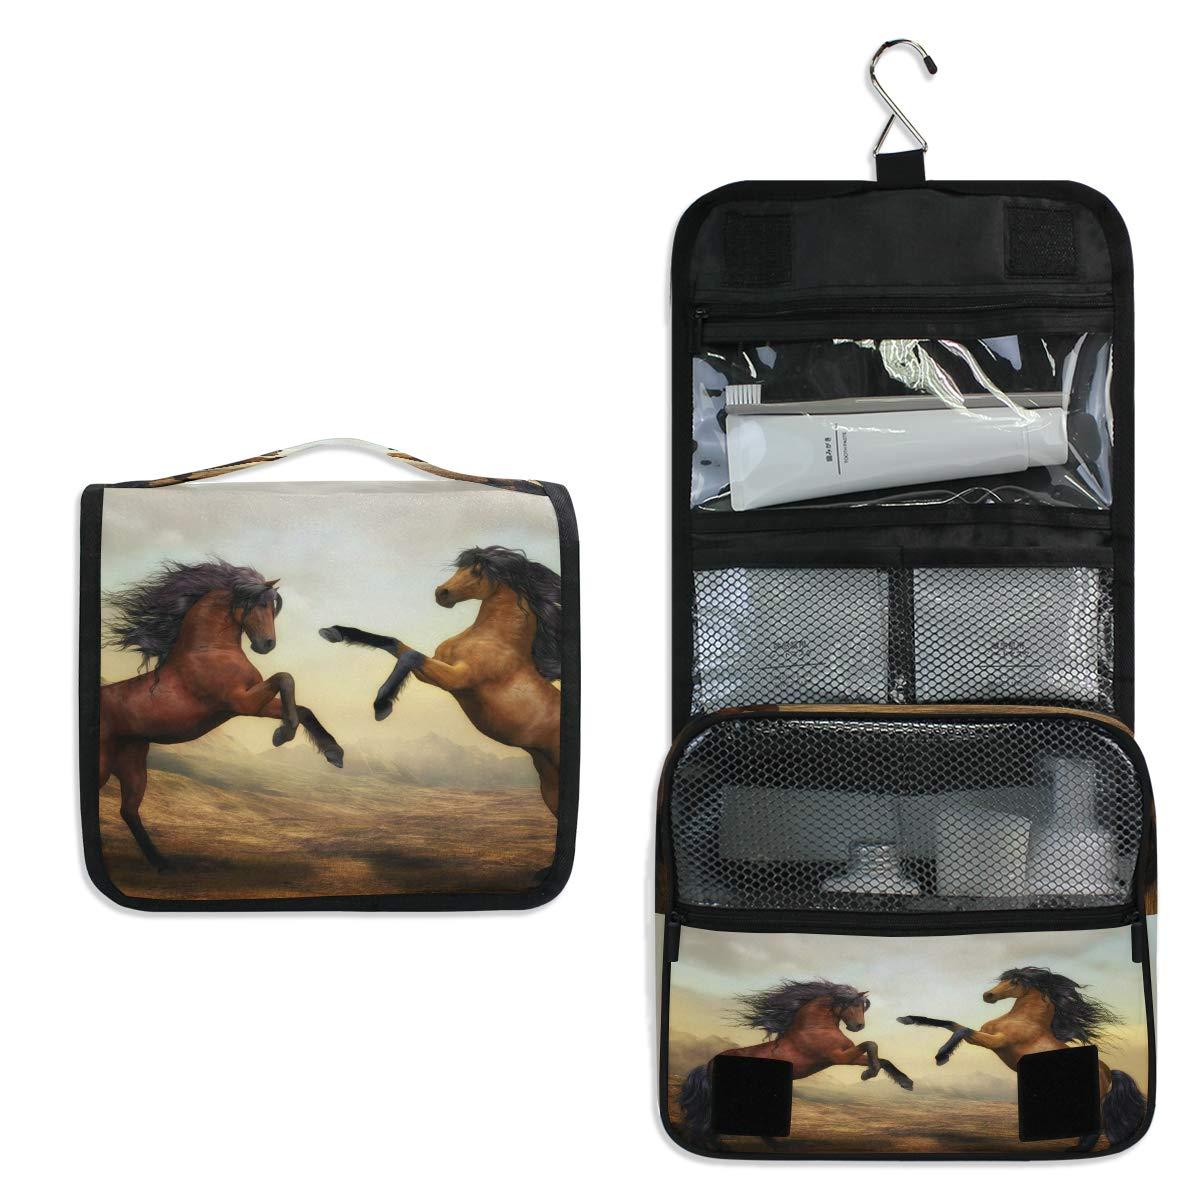 YVONAU Hanging Toiletry Bag War Horse Pattern Portable Travel Cosmetic Makeup Bag Bathroom Shower Shaving Kit Organizer Bag for Men Women